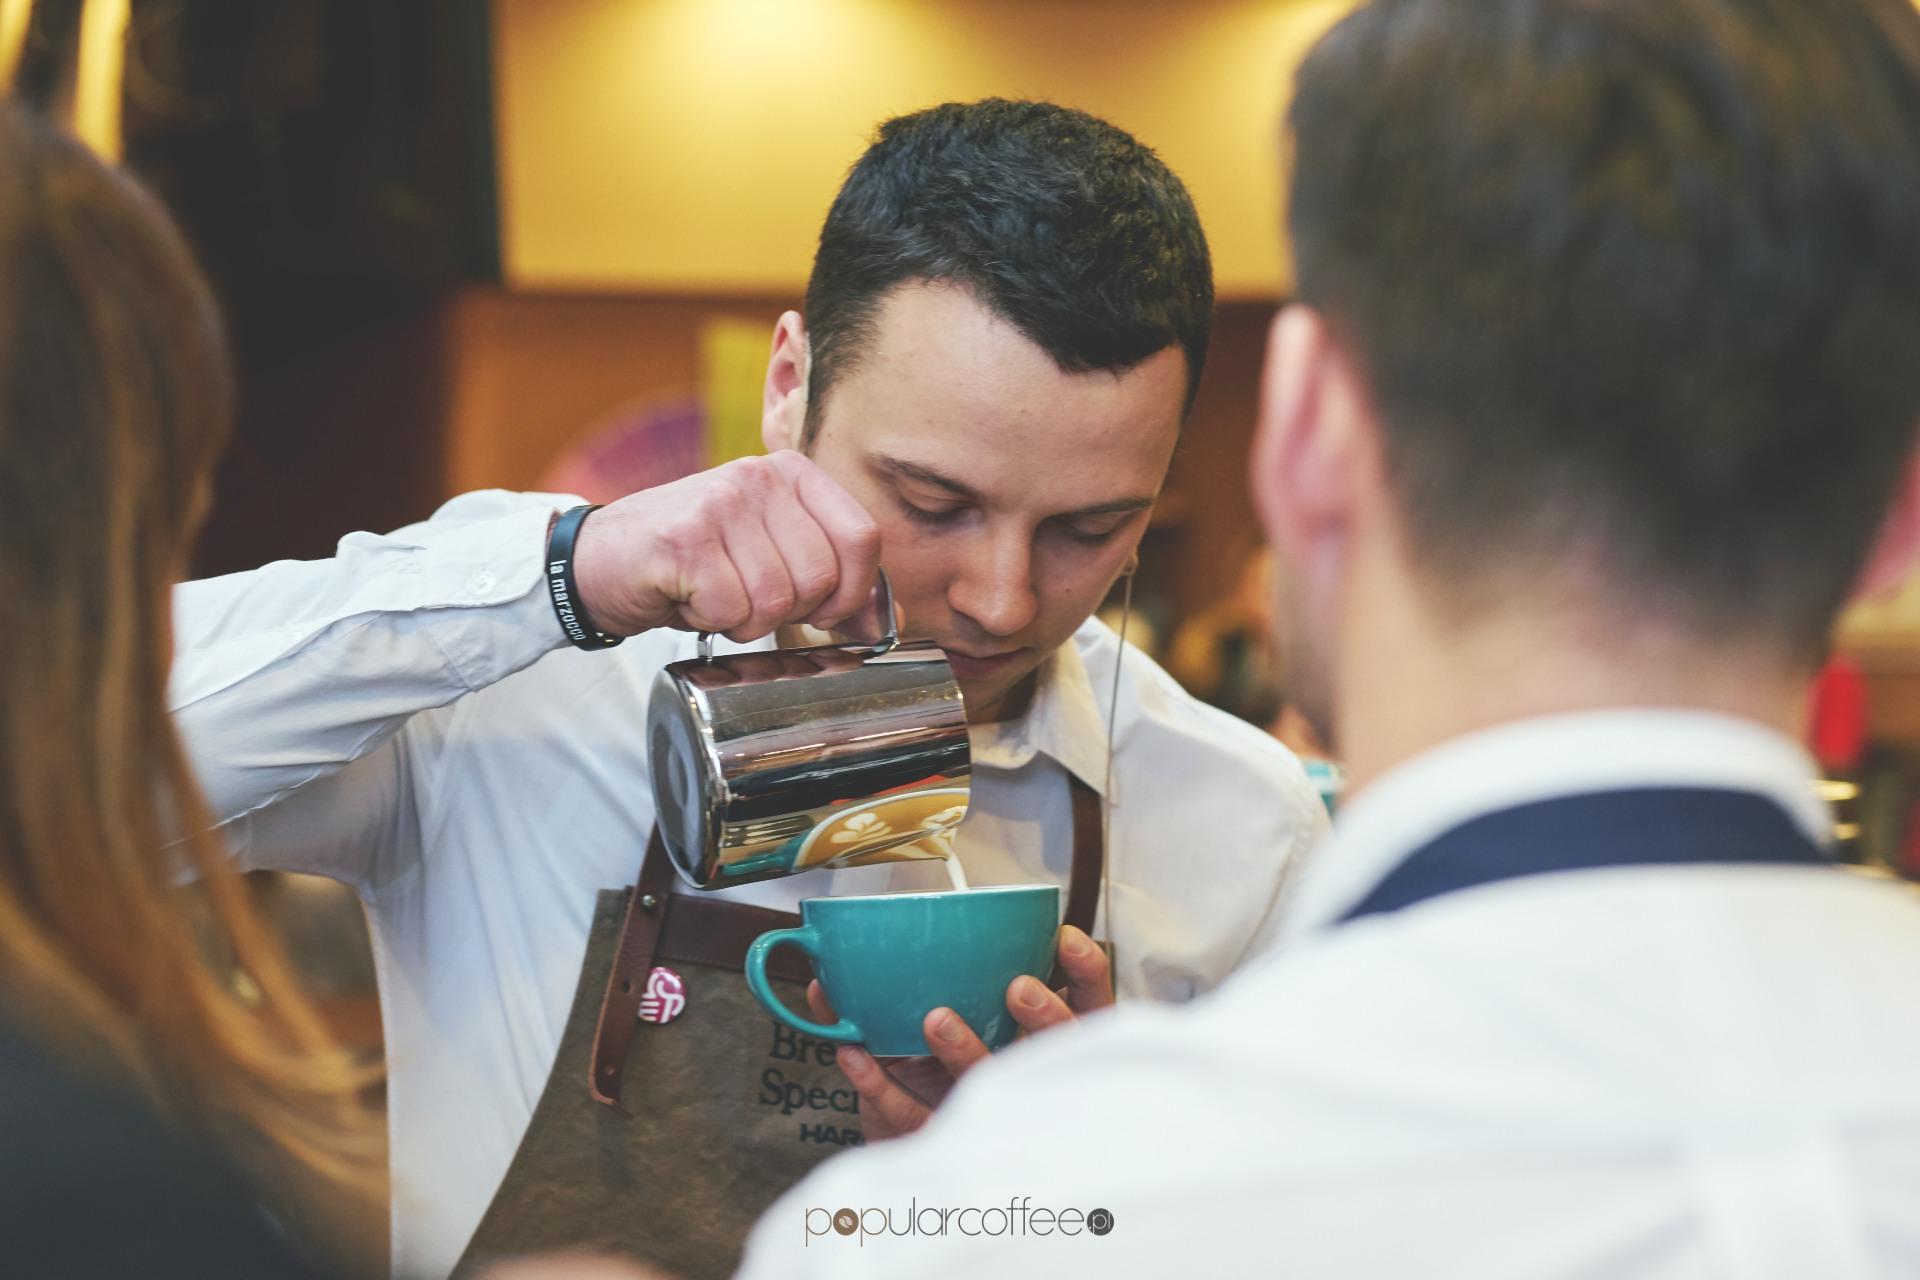 mistrzostwa polski latte art krysiński